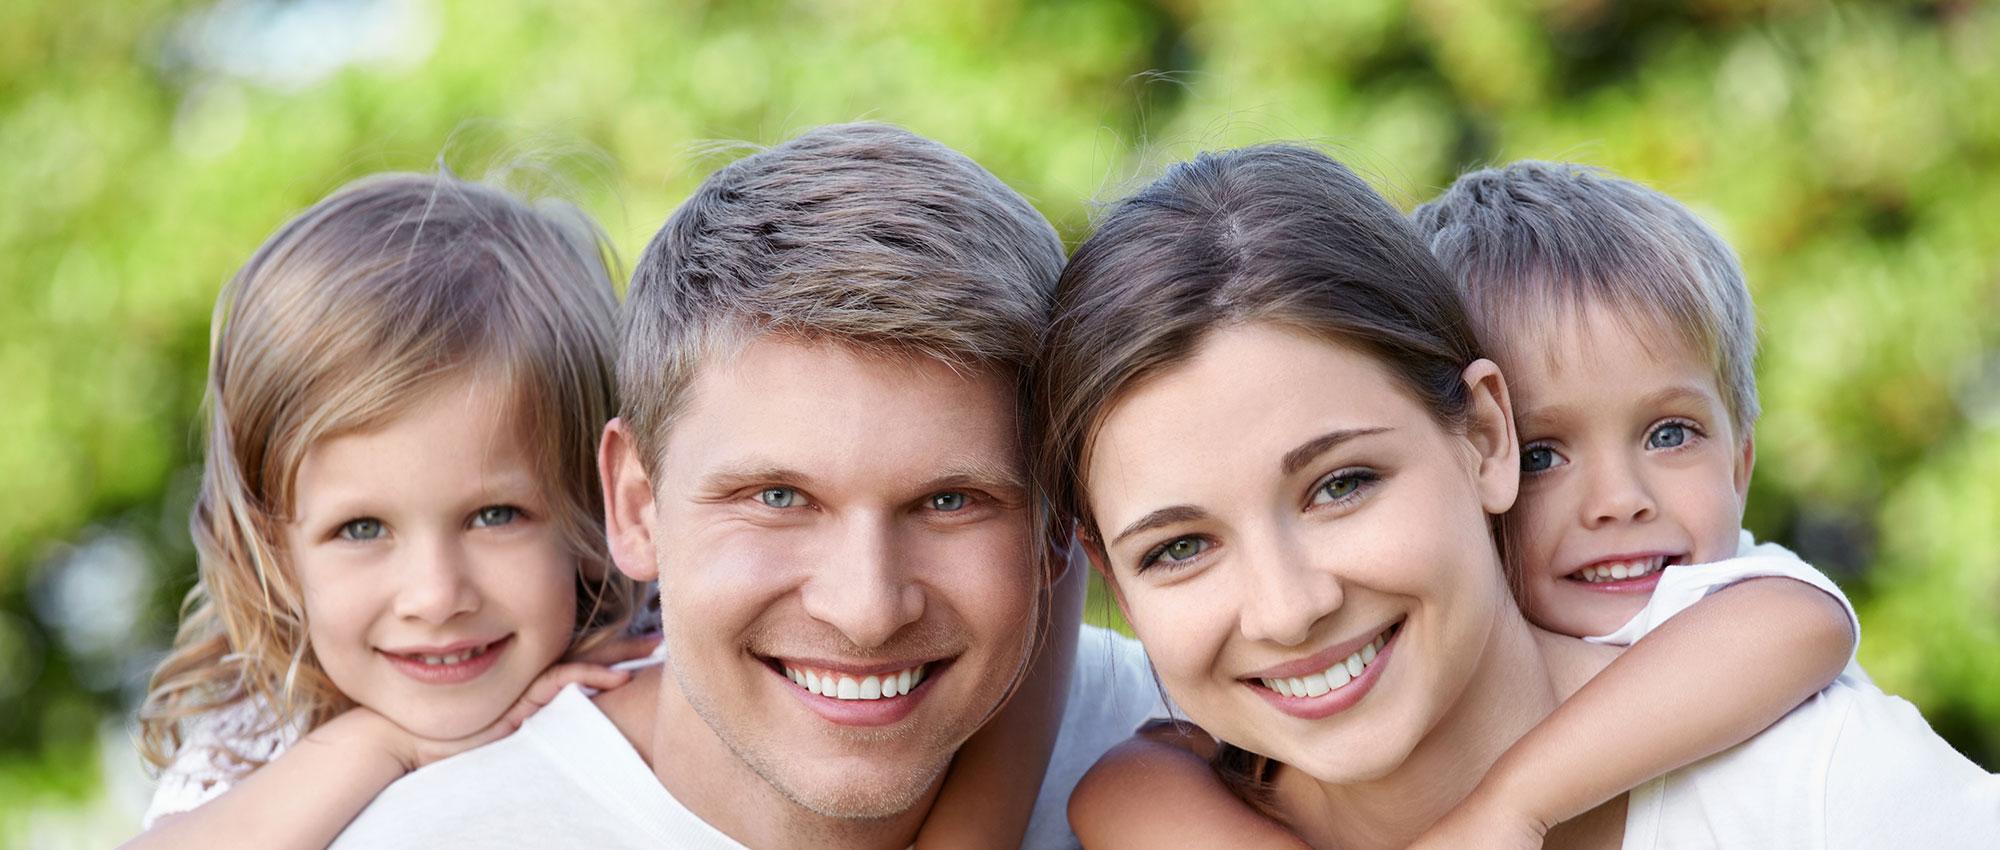 Teeth Whitening Concord Nc Branchview Dental Care